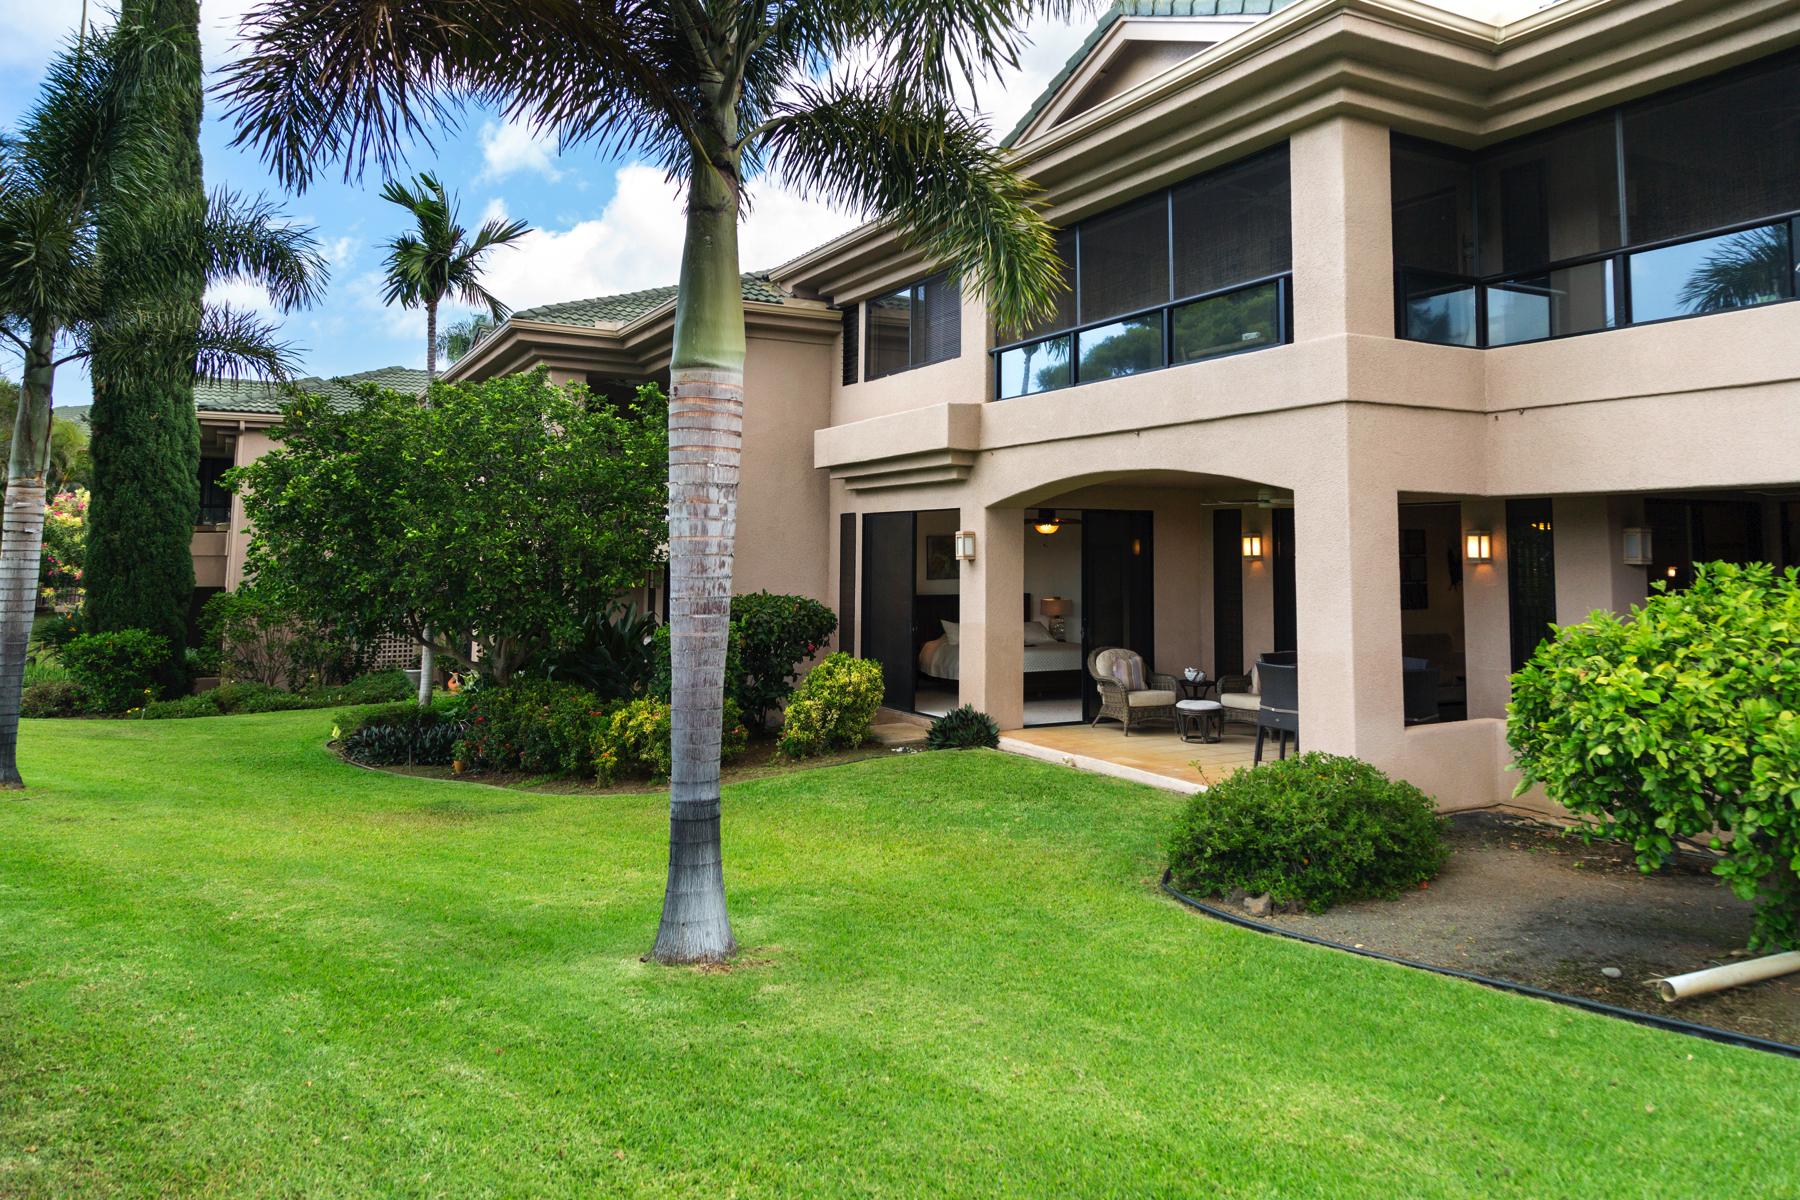 Townhouse for Sale at Waikoloa Fairways 68-1754 Melia St. B114 Waikoloa, Hawaii 96738 United States